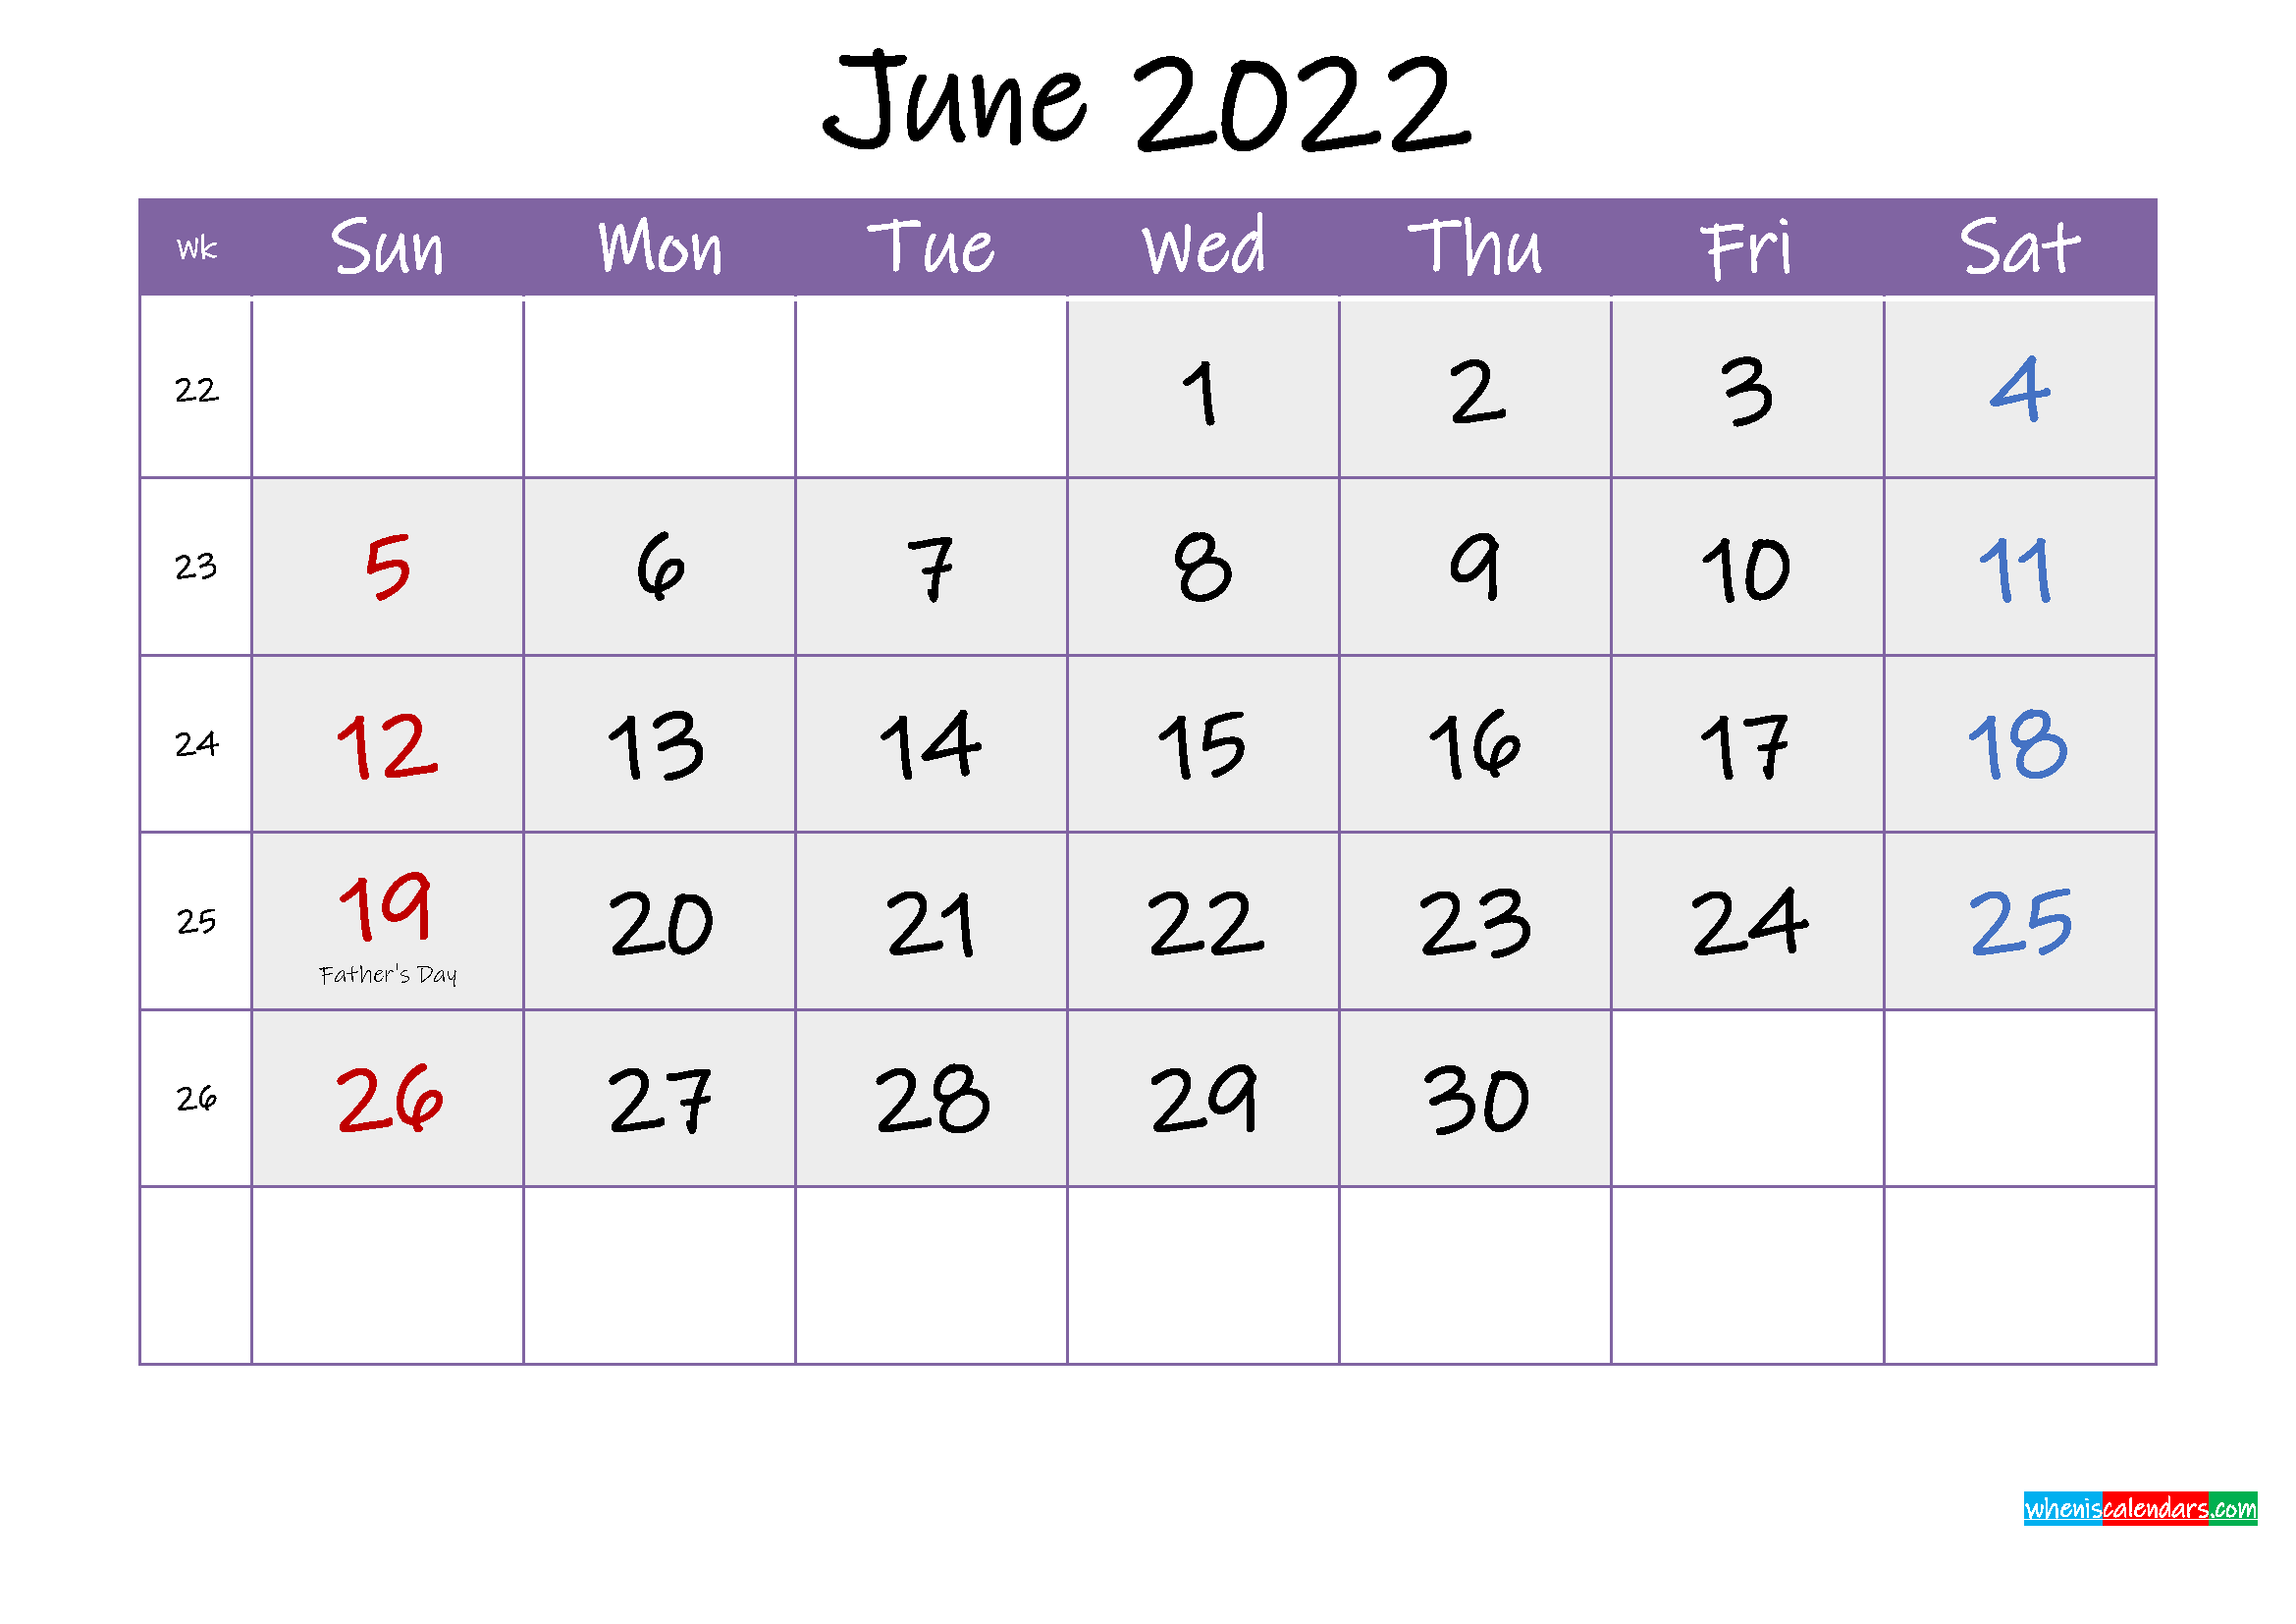 Free June 2022 Printable Calendar with Holidays